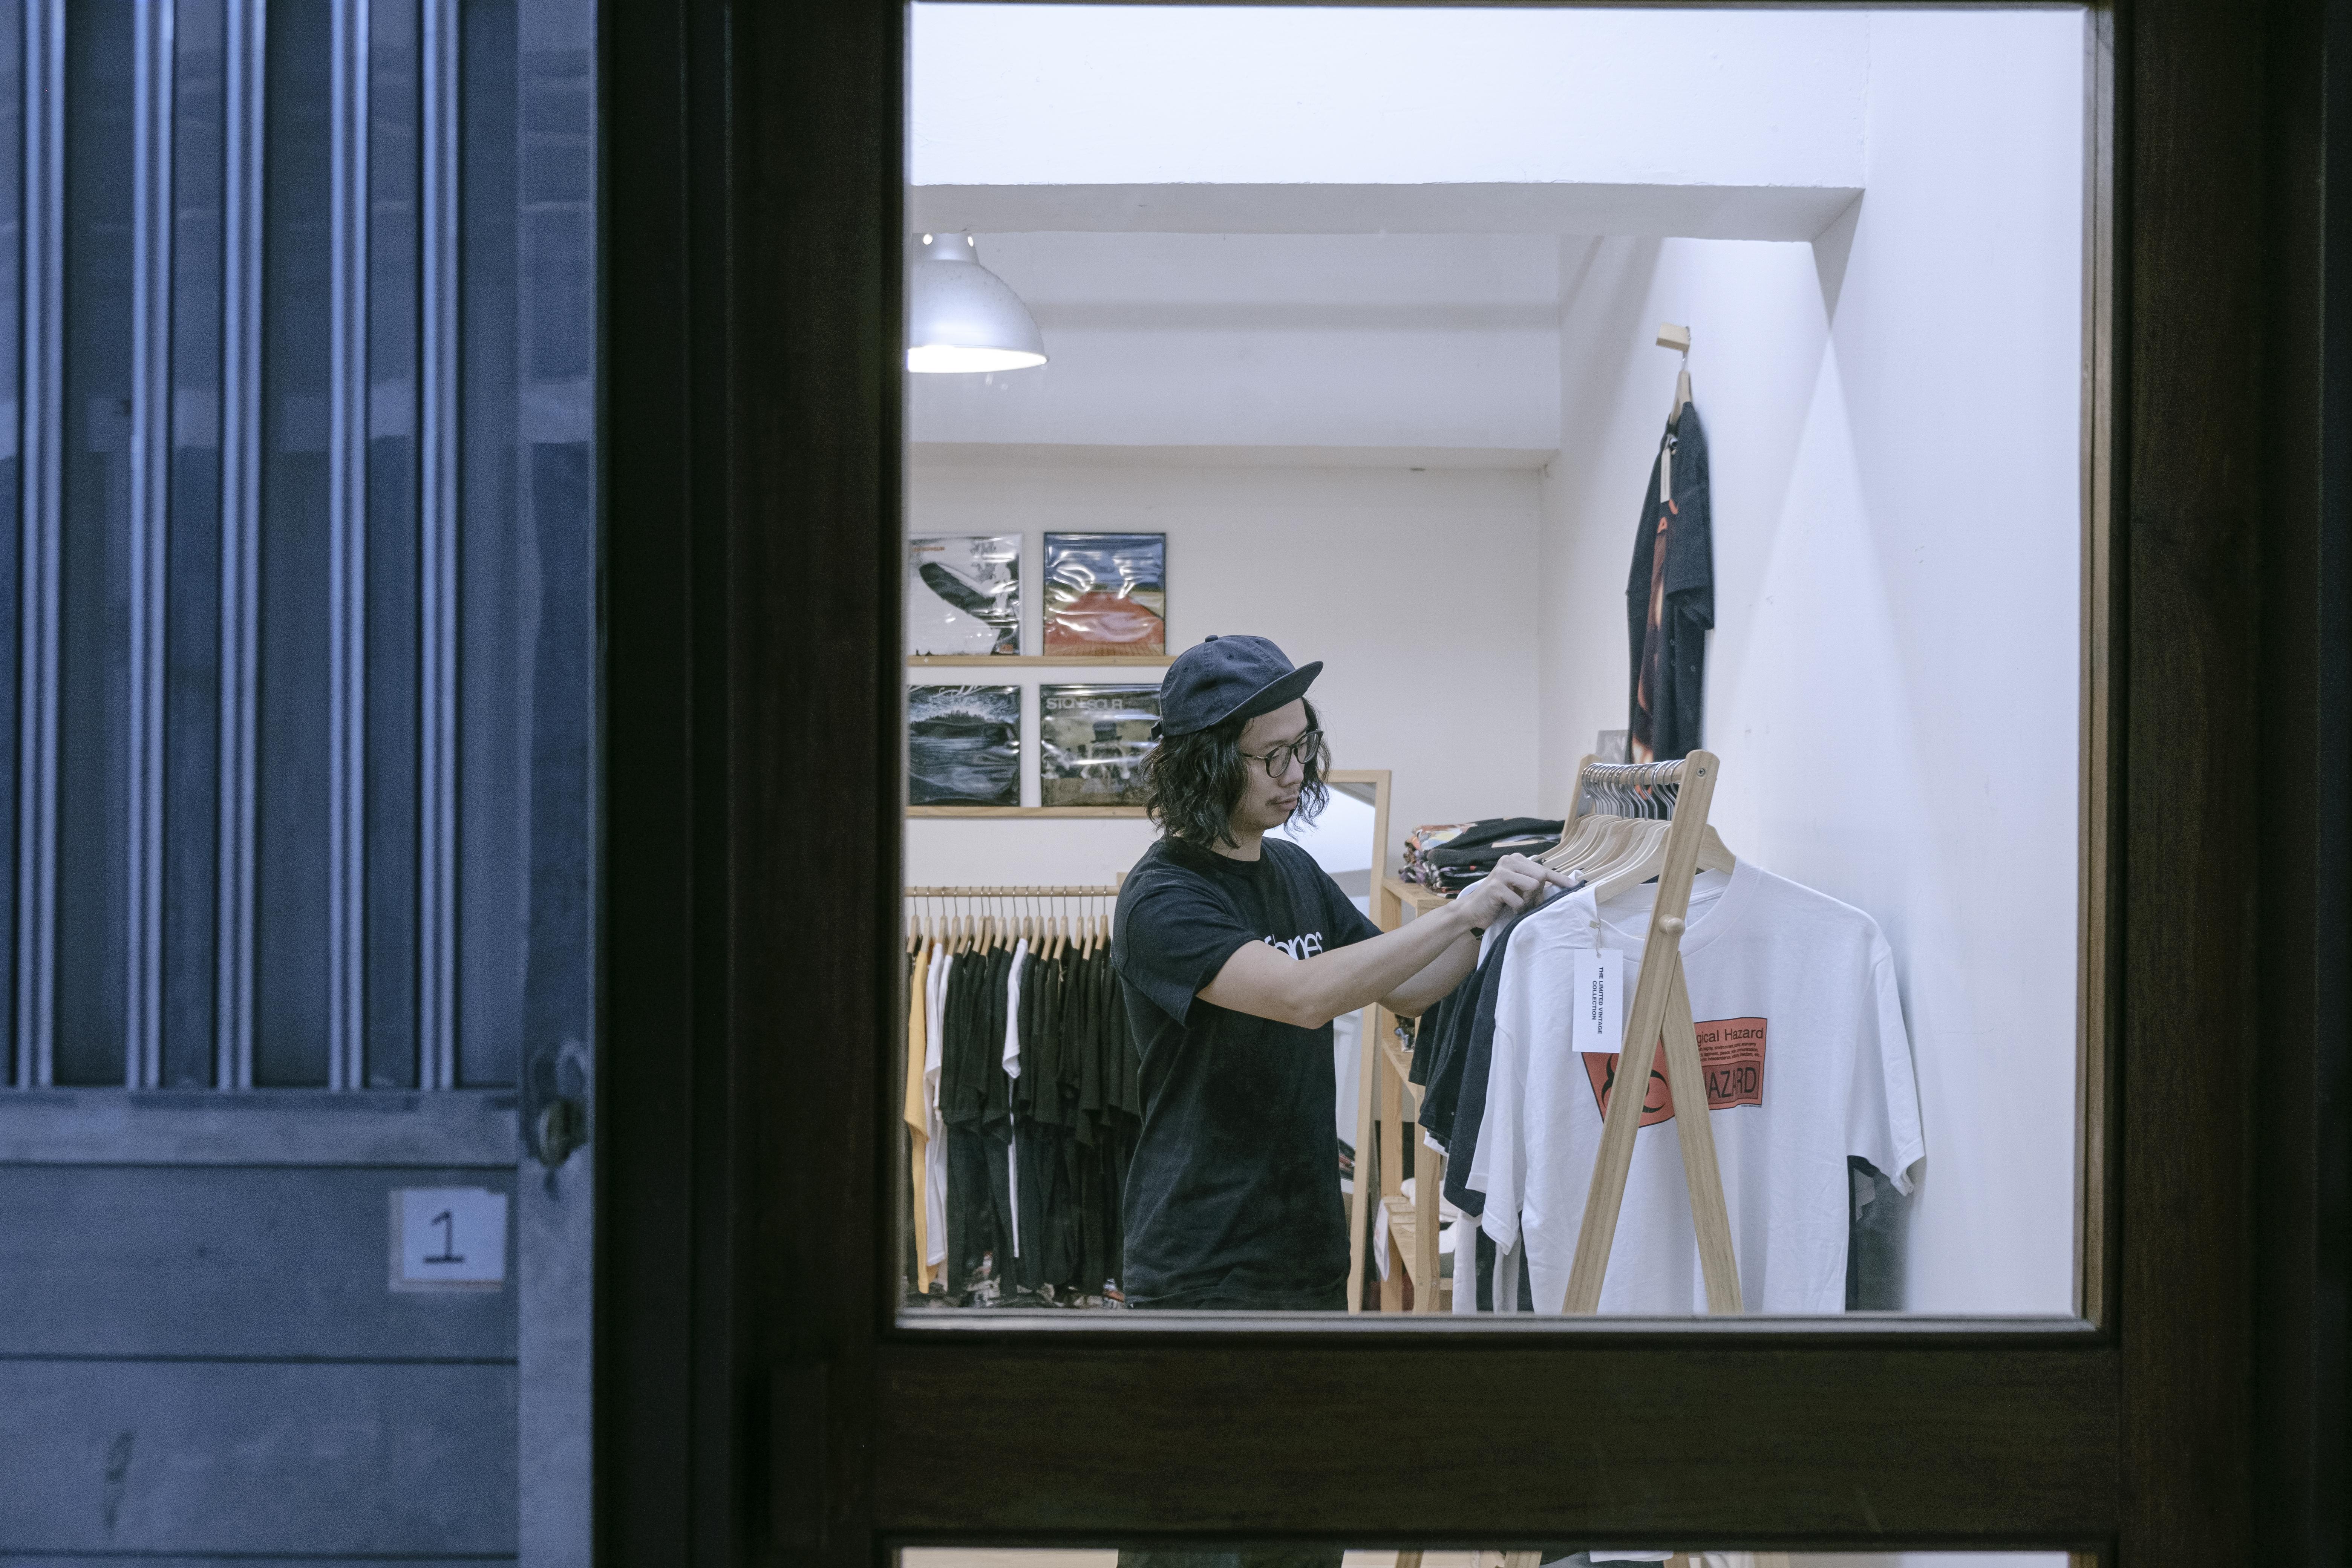 Edwin於二〇一七年開設Lefthanded Band Tee實體舖,成為樂迷必去小店。